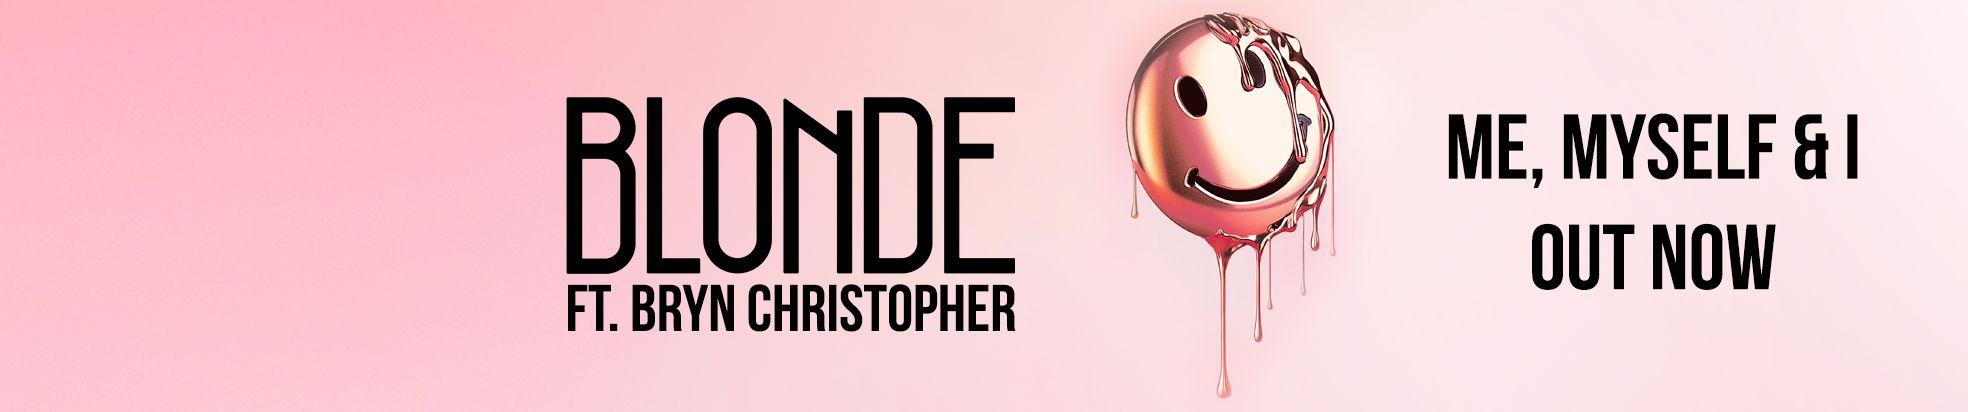 Blonde - Higher Ground (feat  Charli Taft) by Blonde | Free